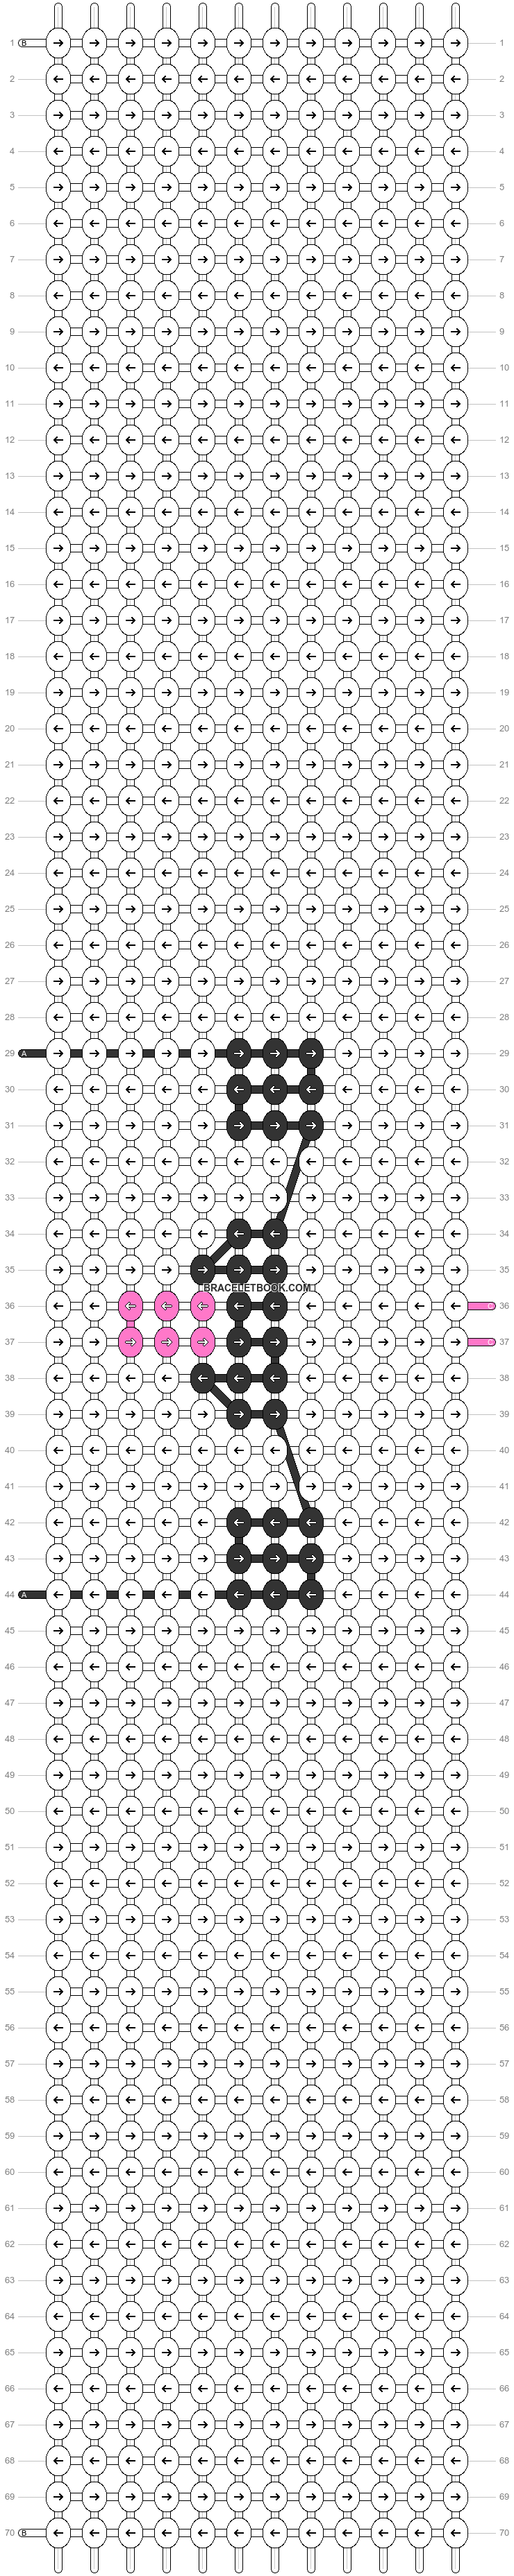 Alpha pattern #45880 variation #132104 pattern